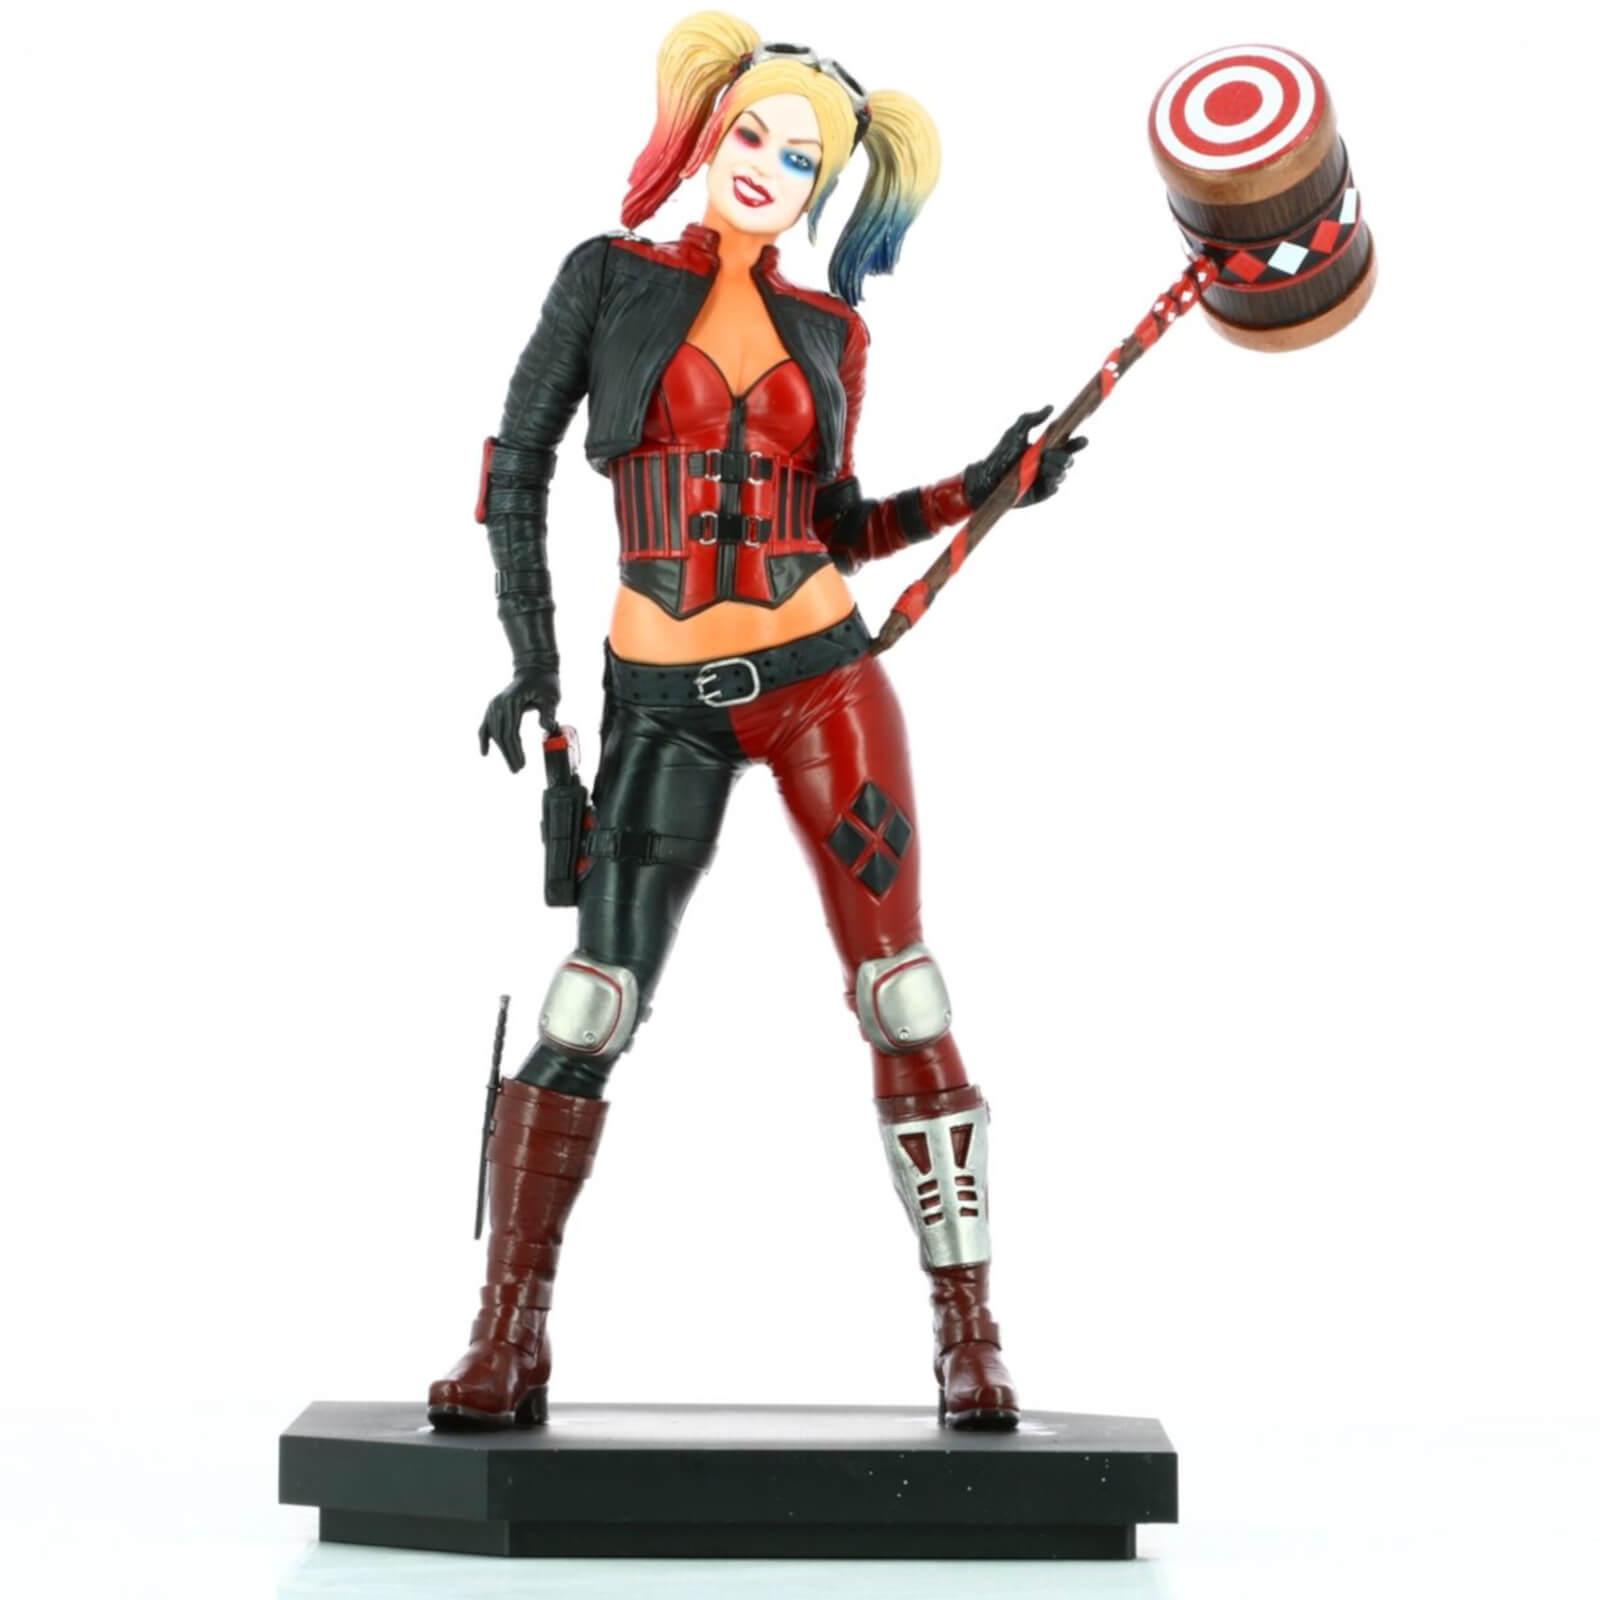 DC Gallery Injustice 2 Harley Quinn PVC Statue - 23cm